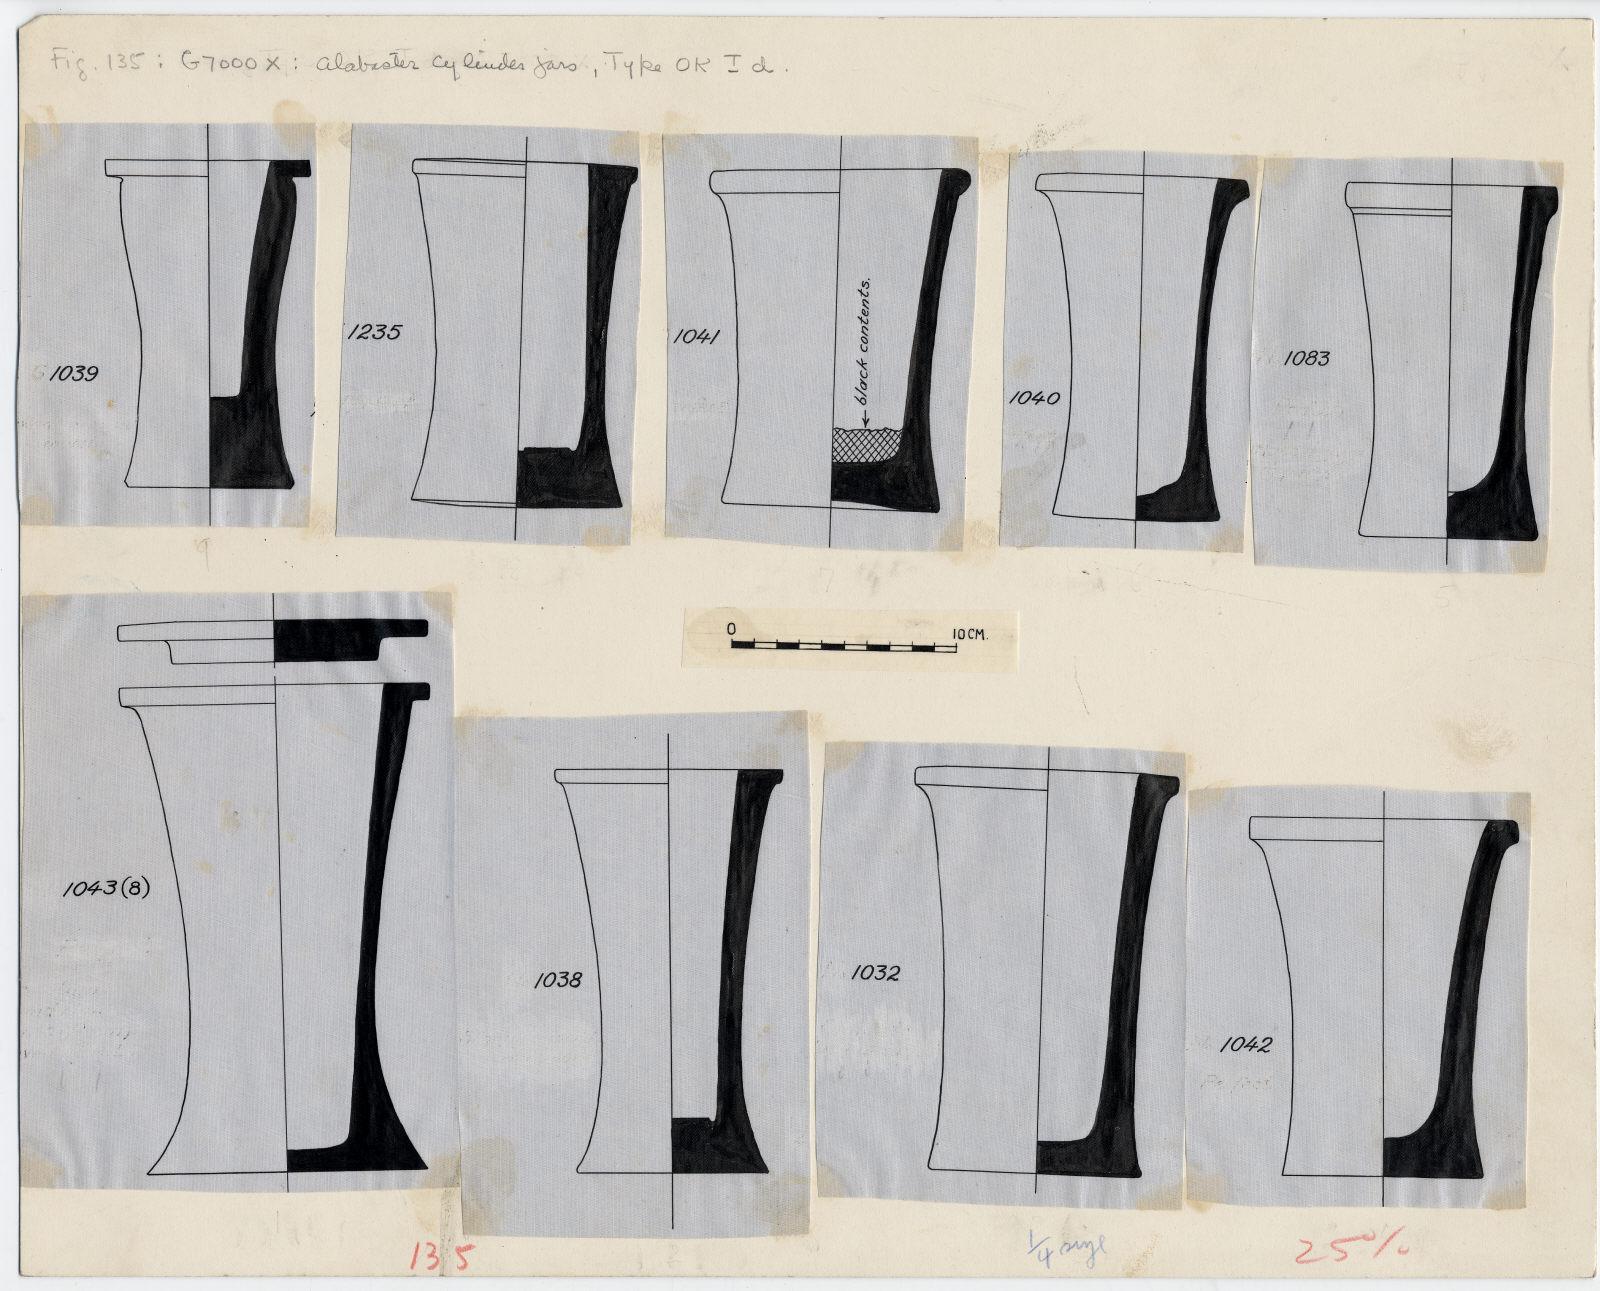 Drawings: G 7000 X: cylinder jars, alabaster